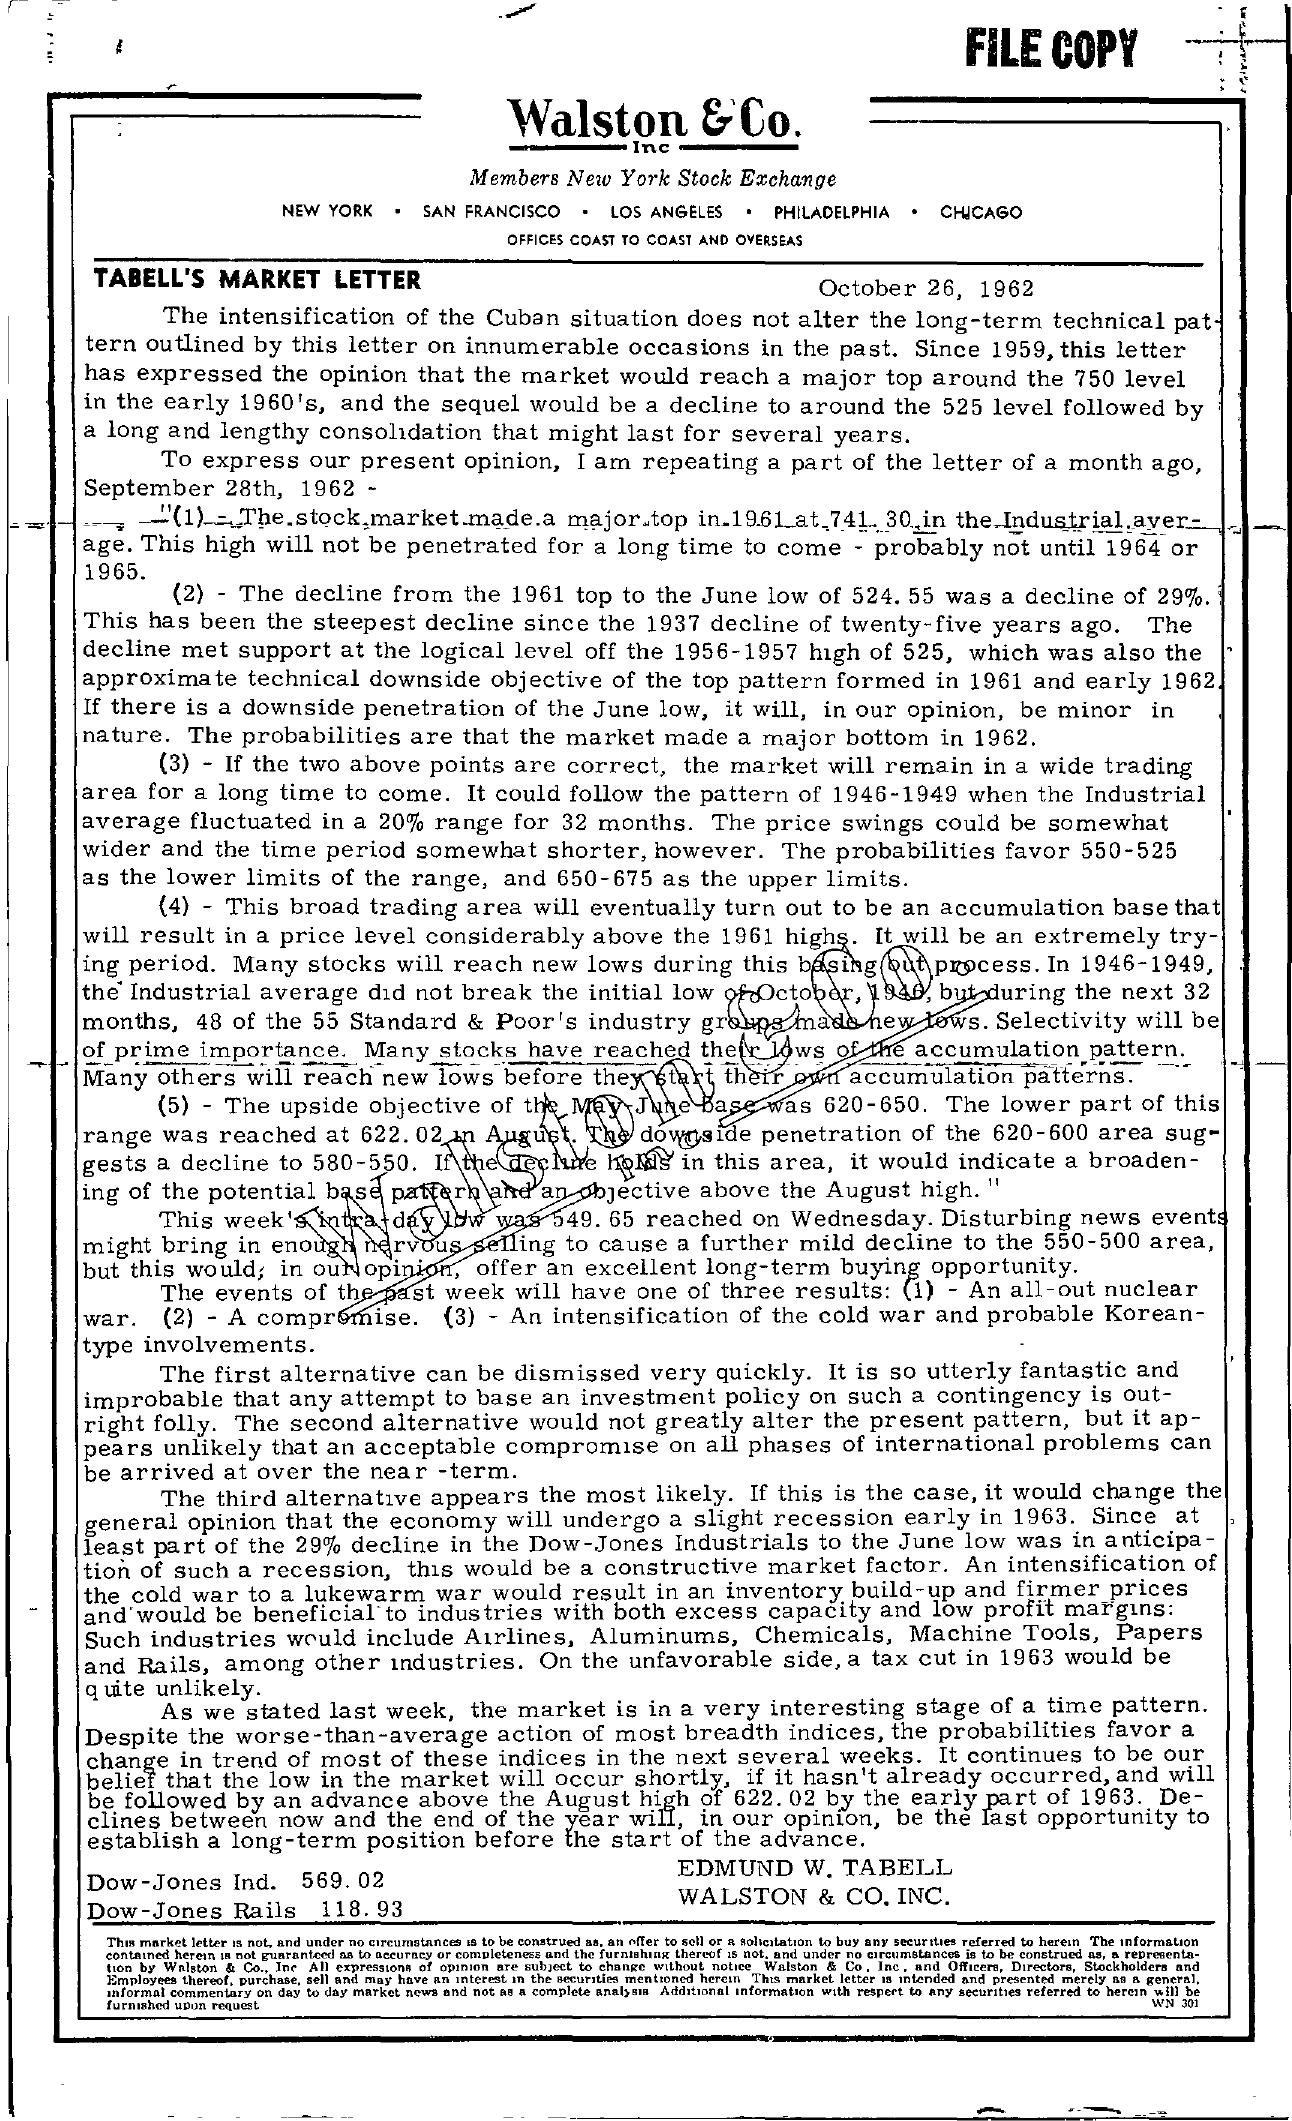 Tabell's Market Letter - October 26, 1962